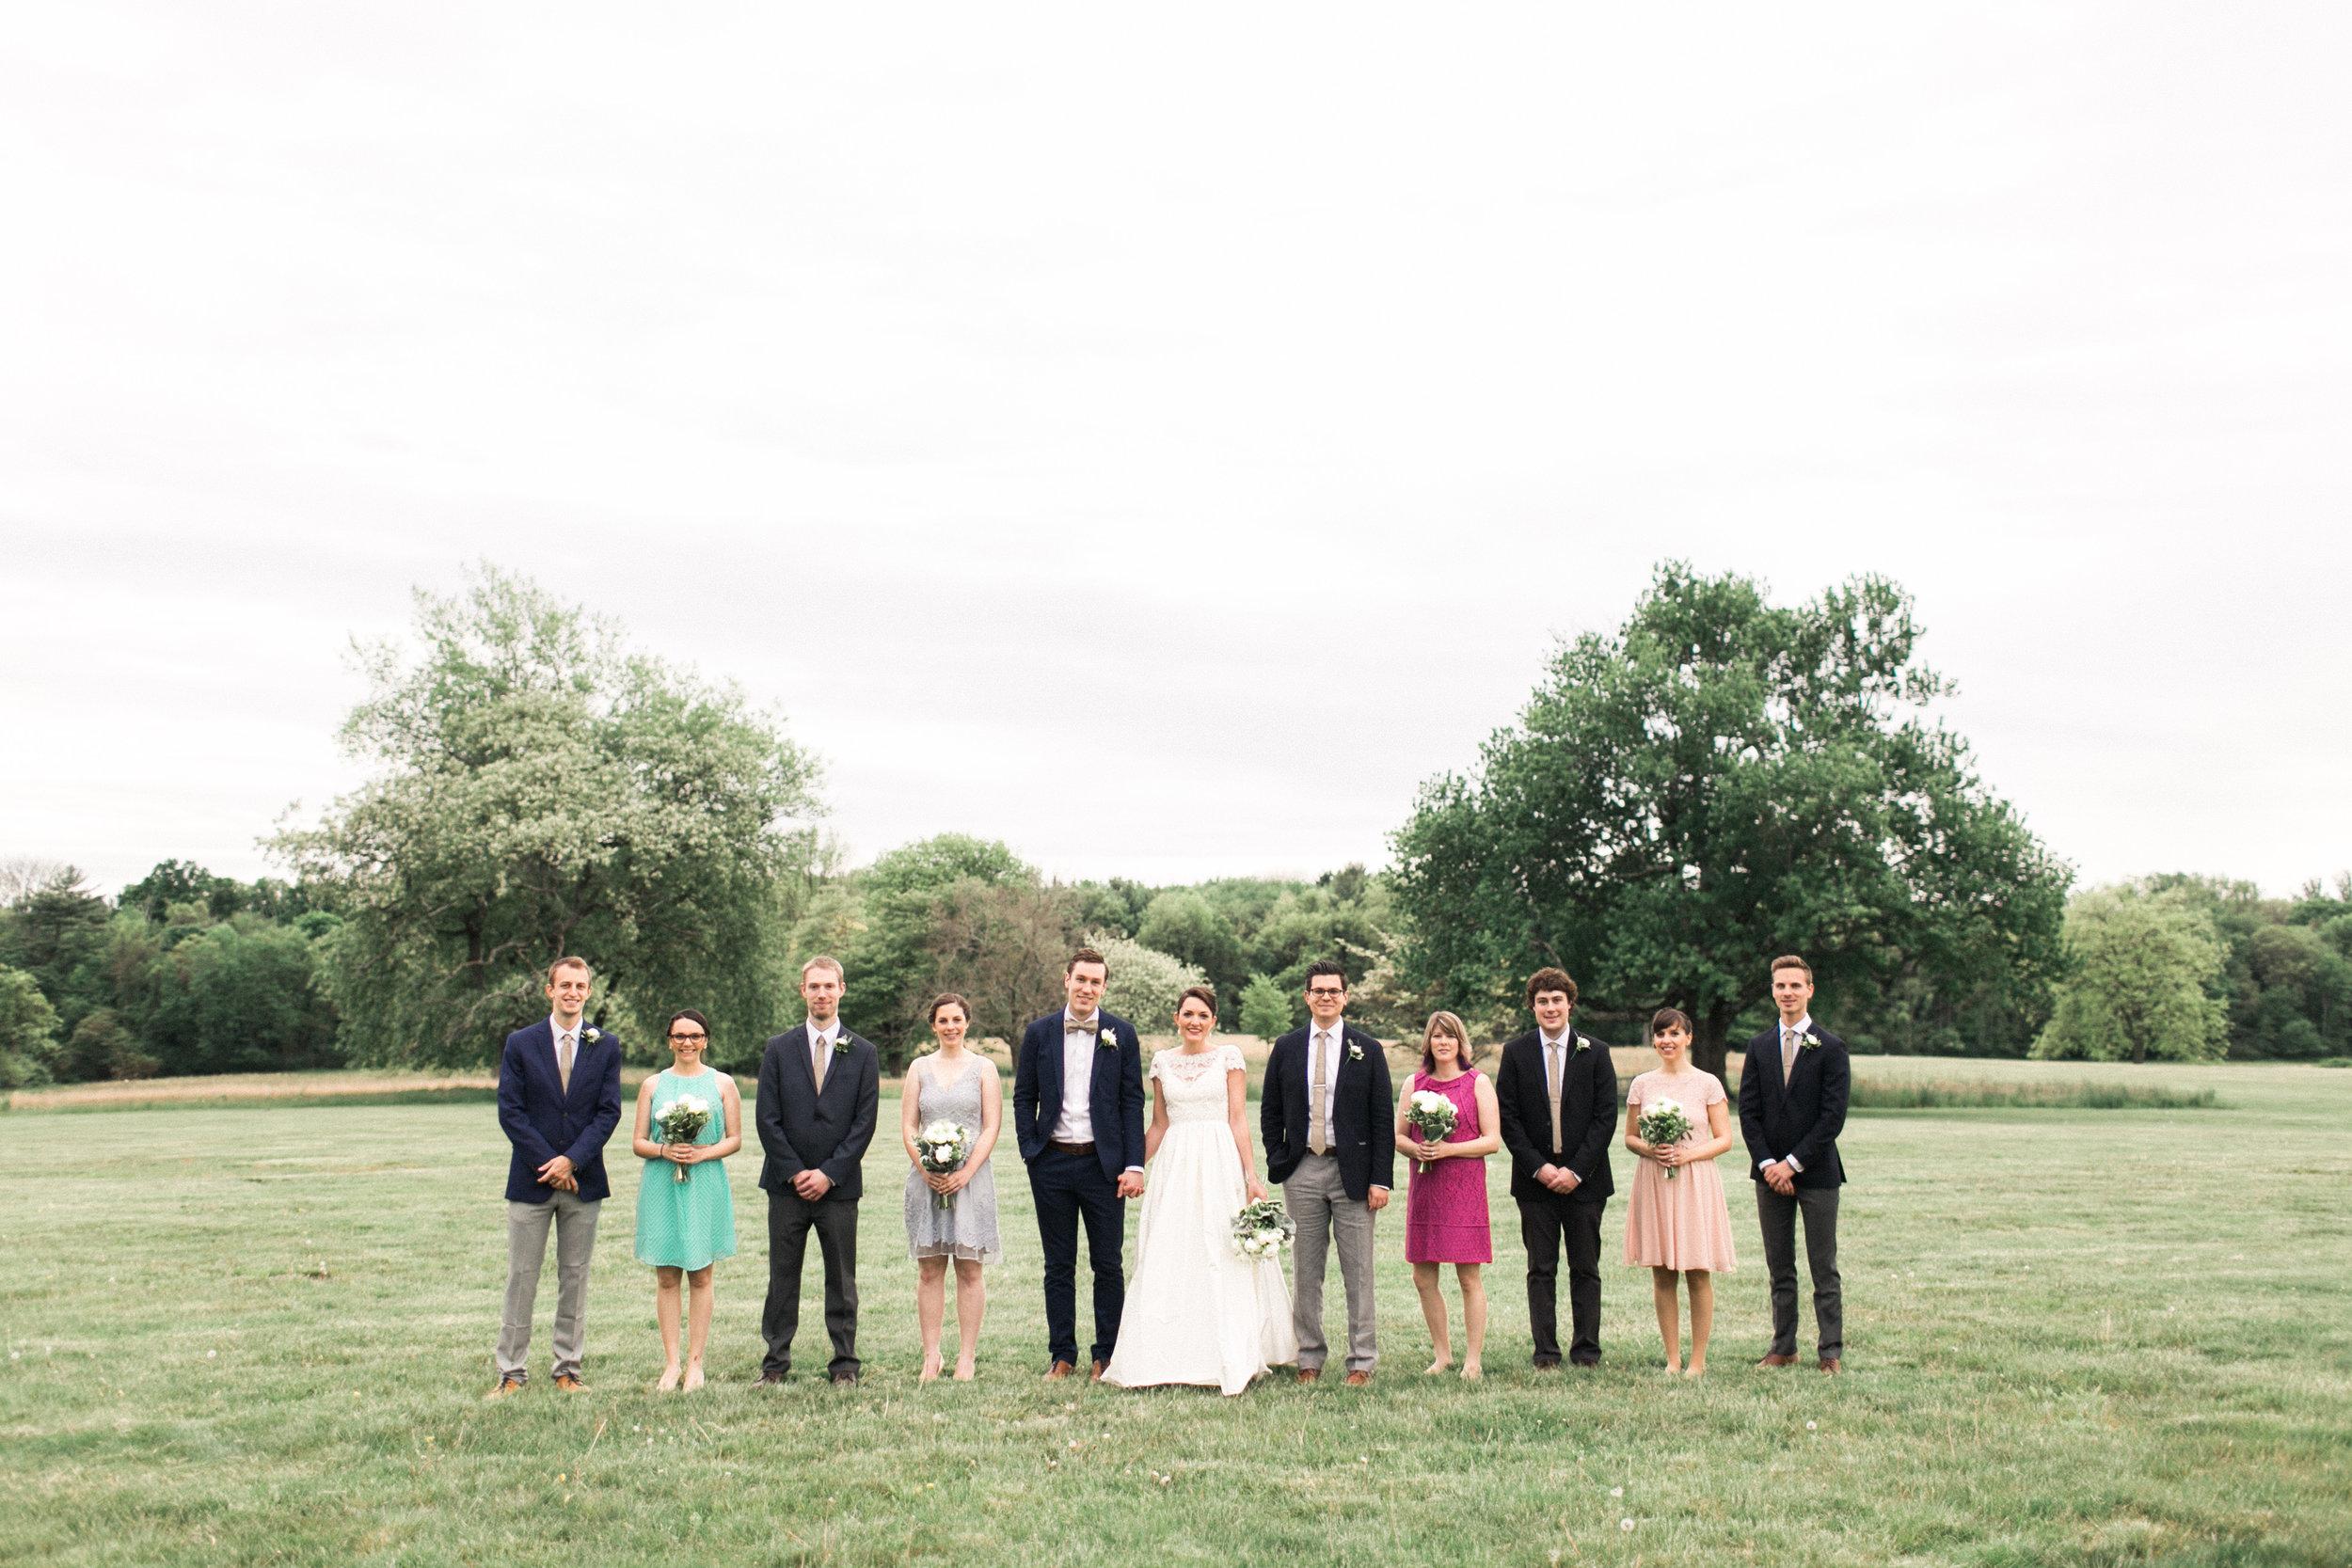 mayden photography weddings-46.jpg